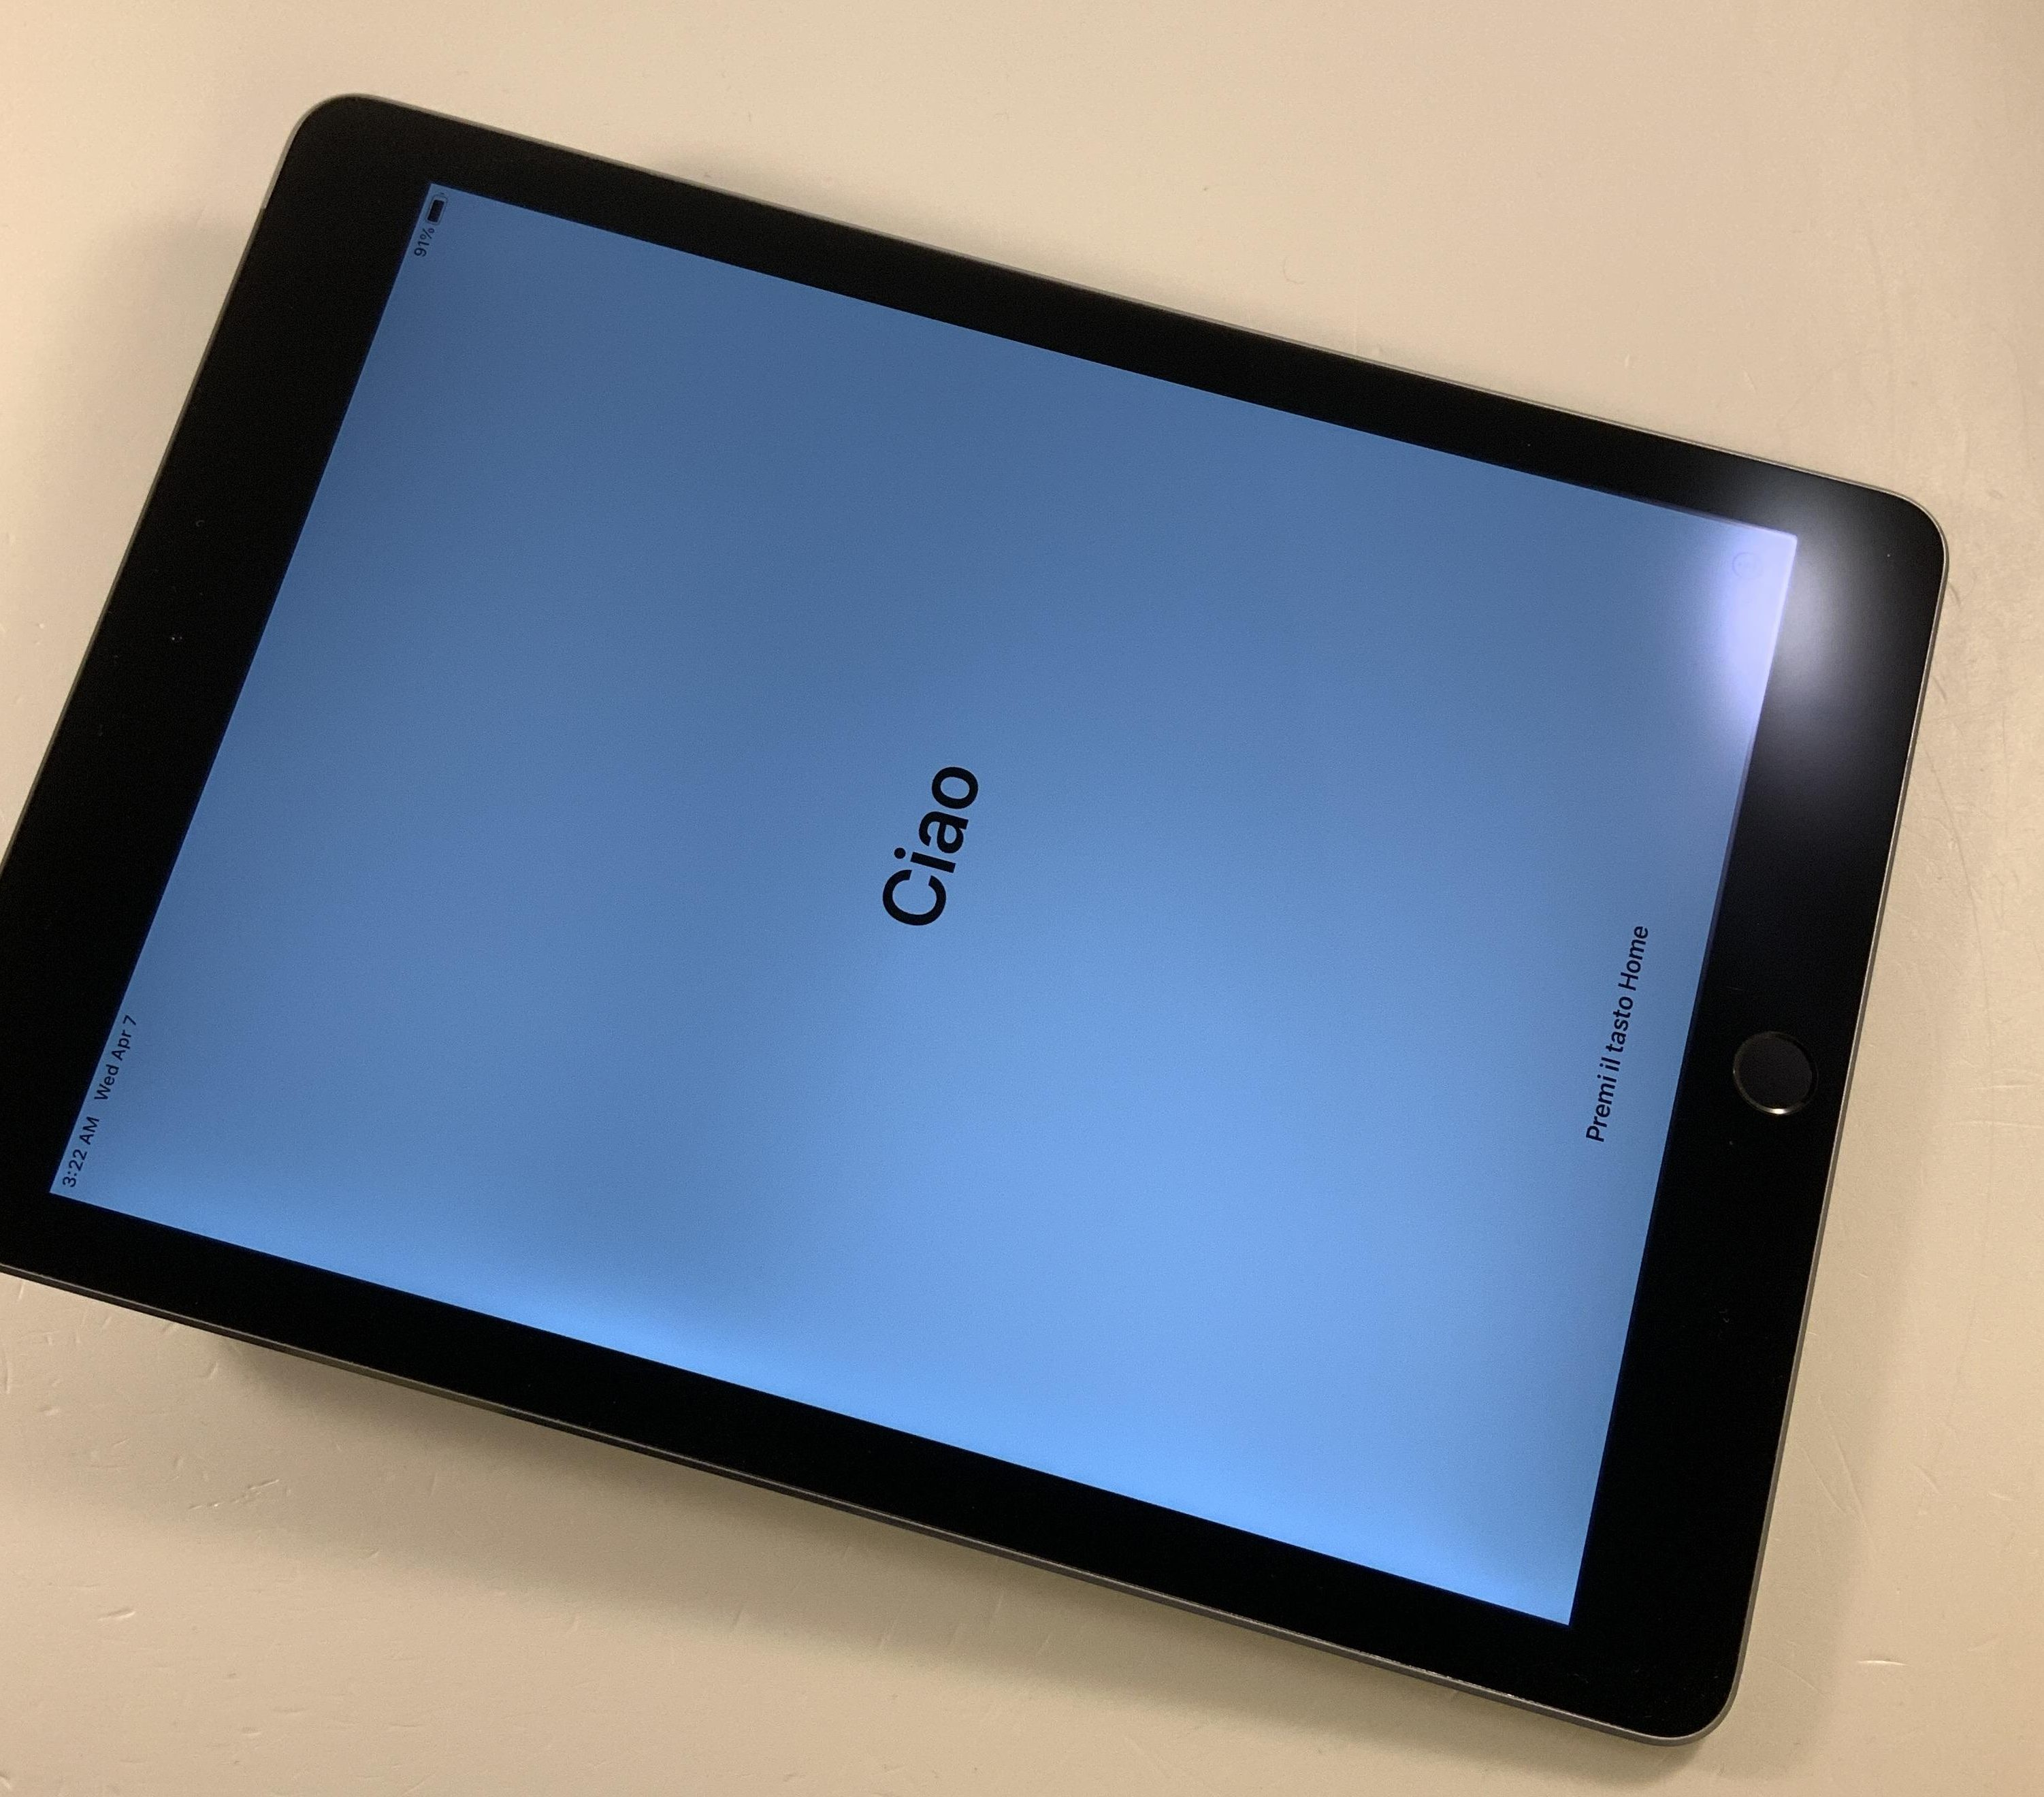 iPad Air 2 Wi-Fi + Cellular 64GB, 64GB, Space Gray, immagine 5